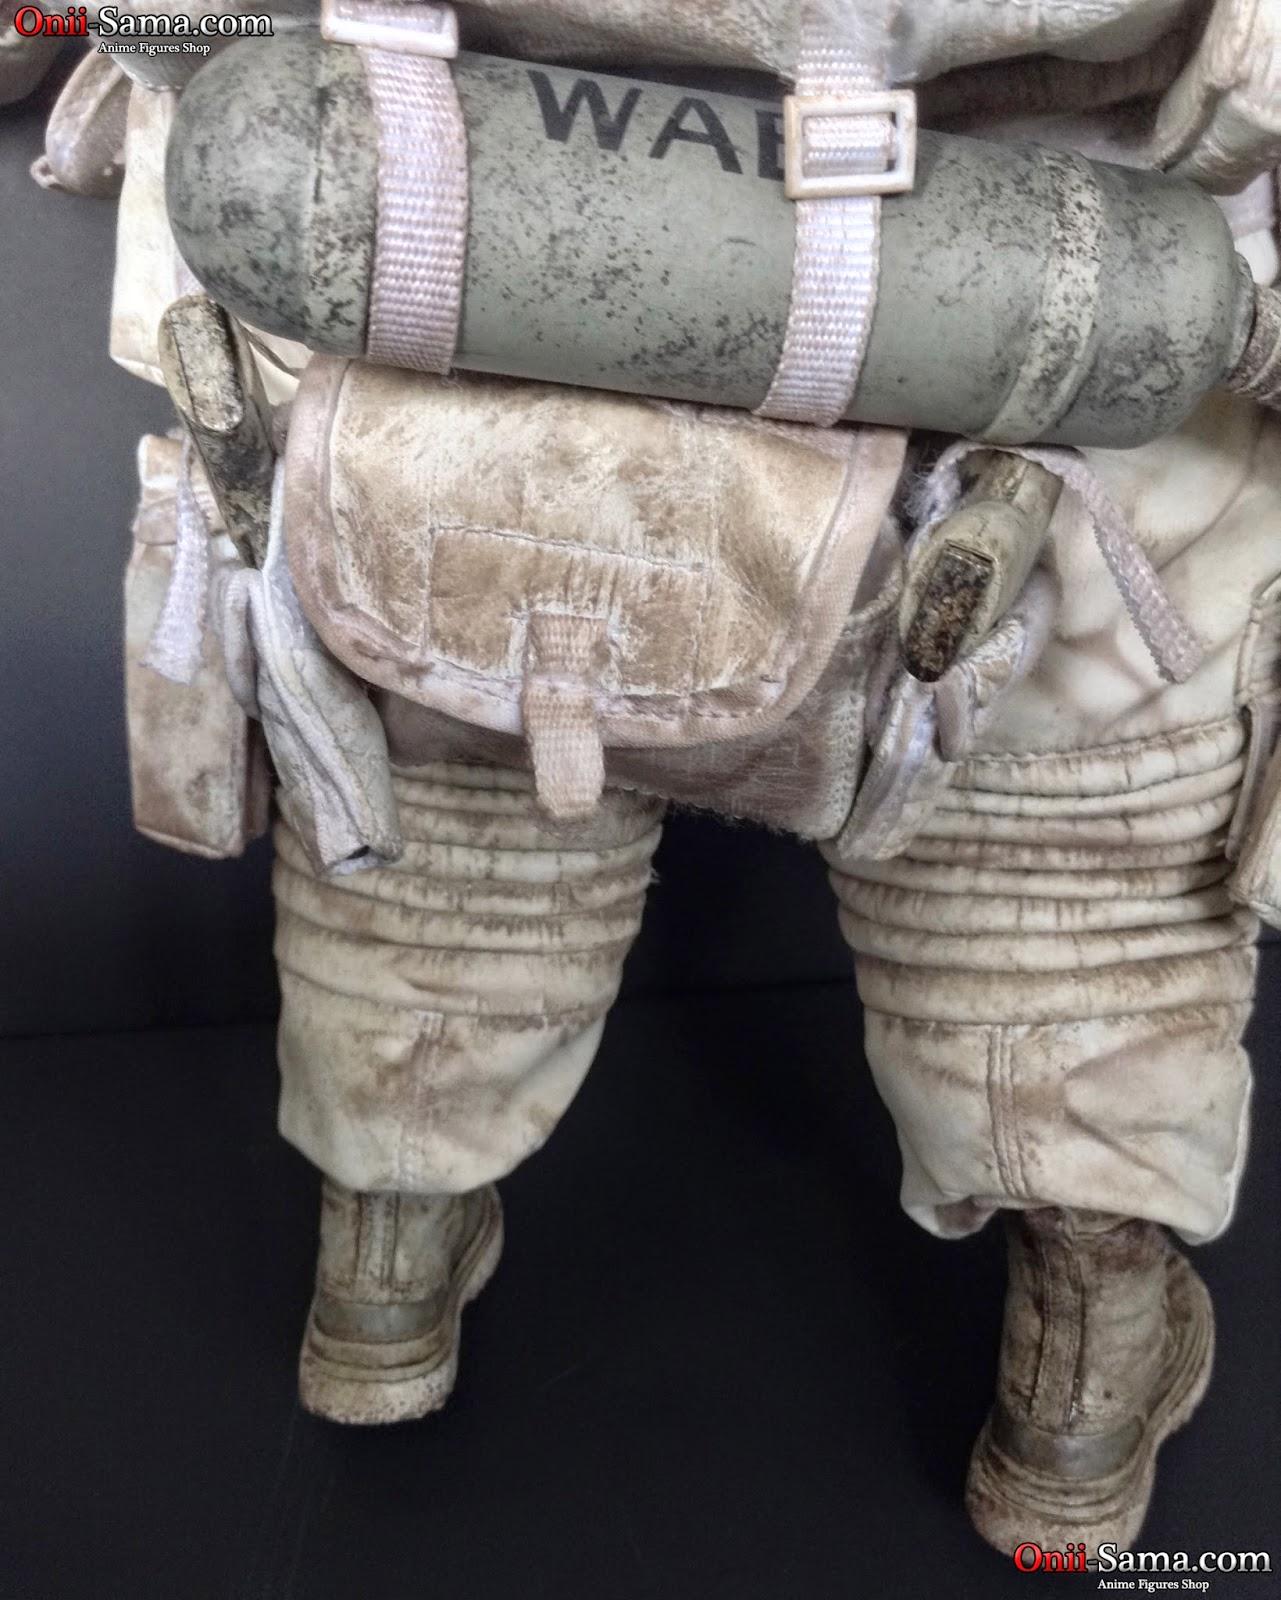 astronaut statue spokane - photo #29